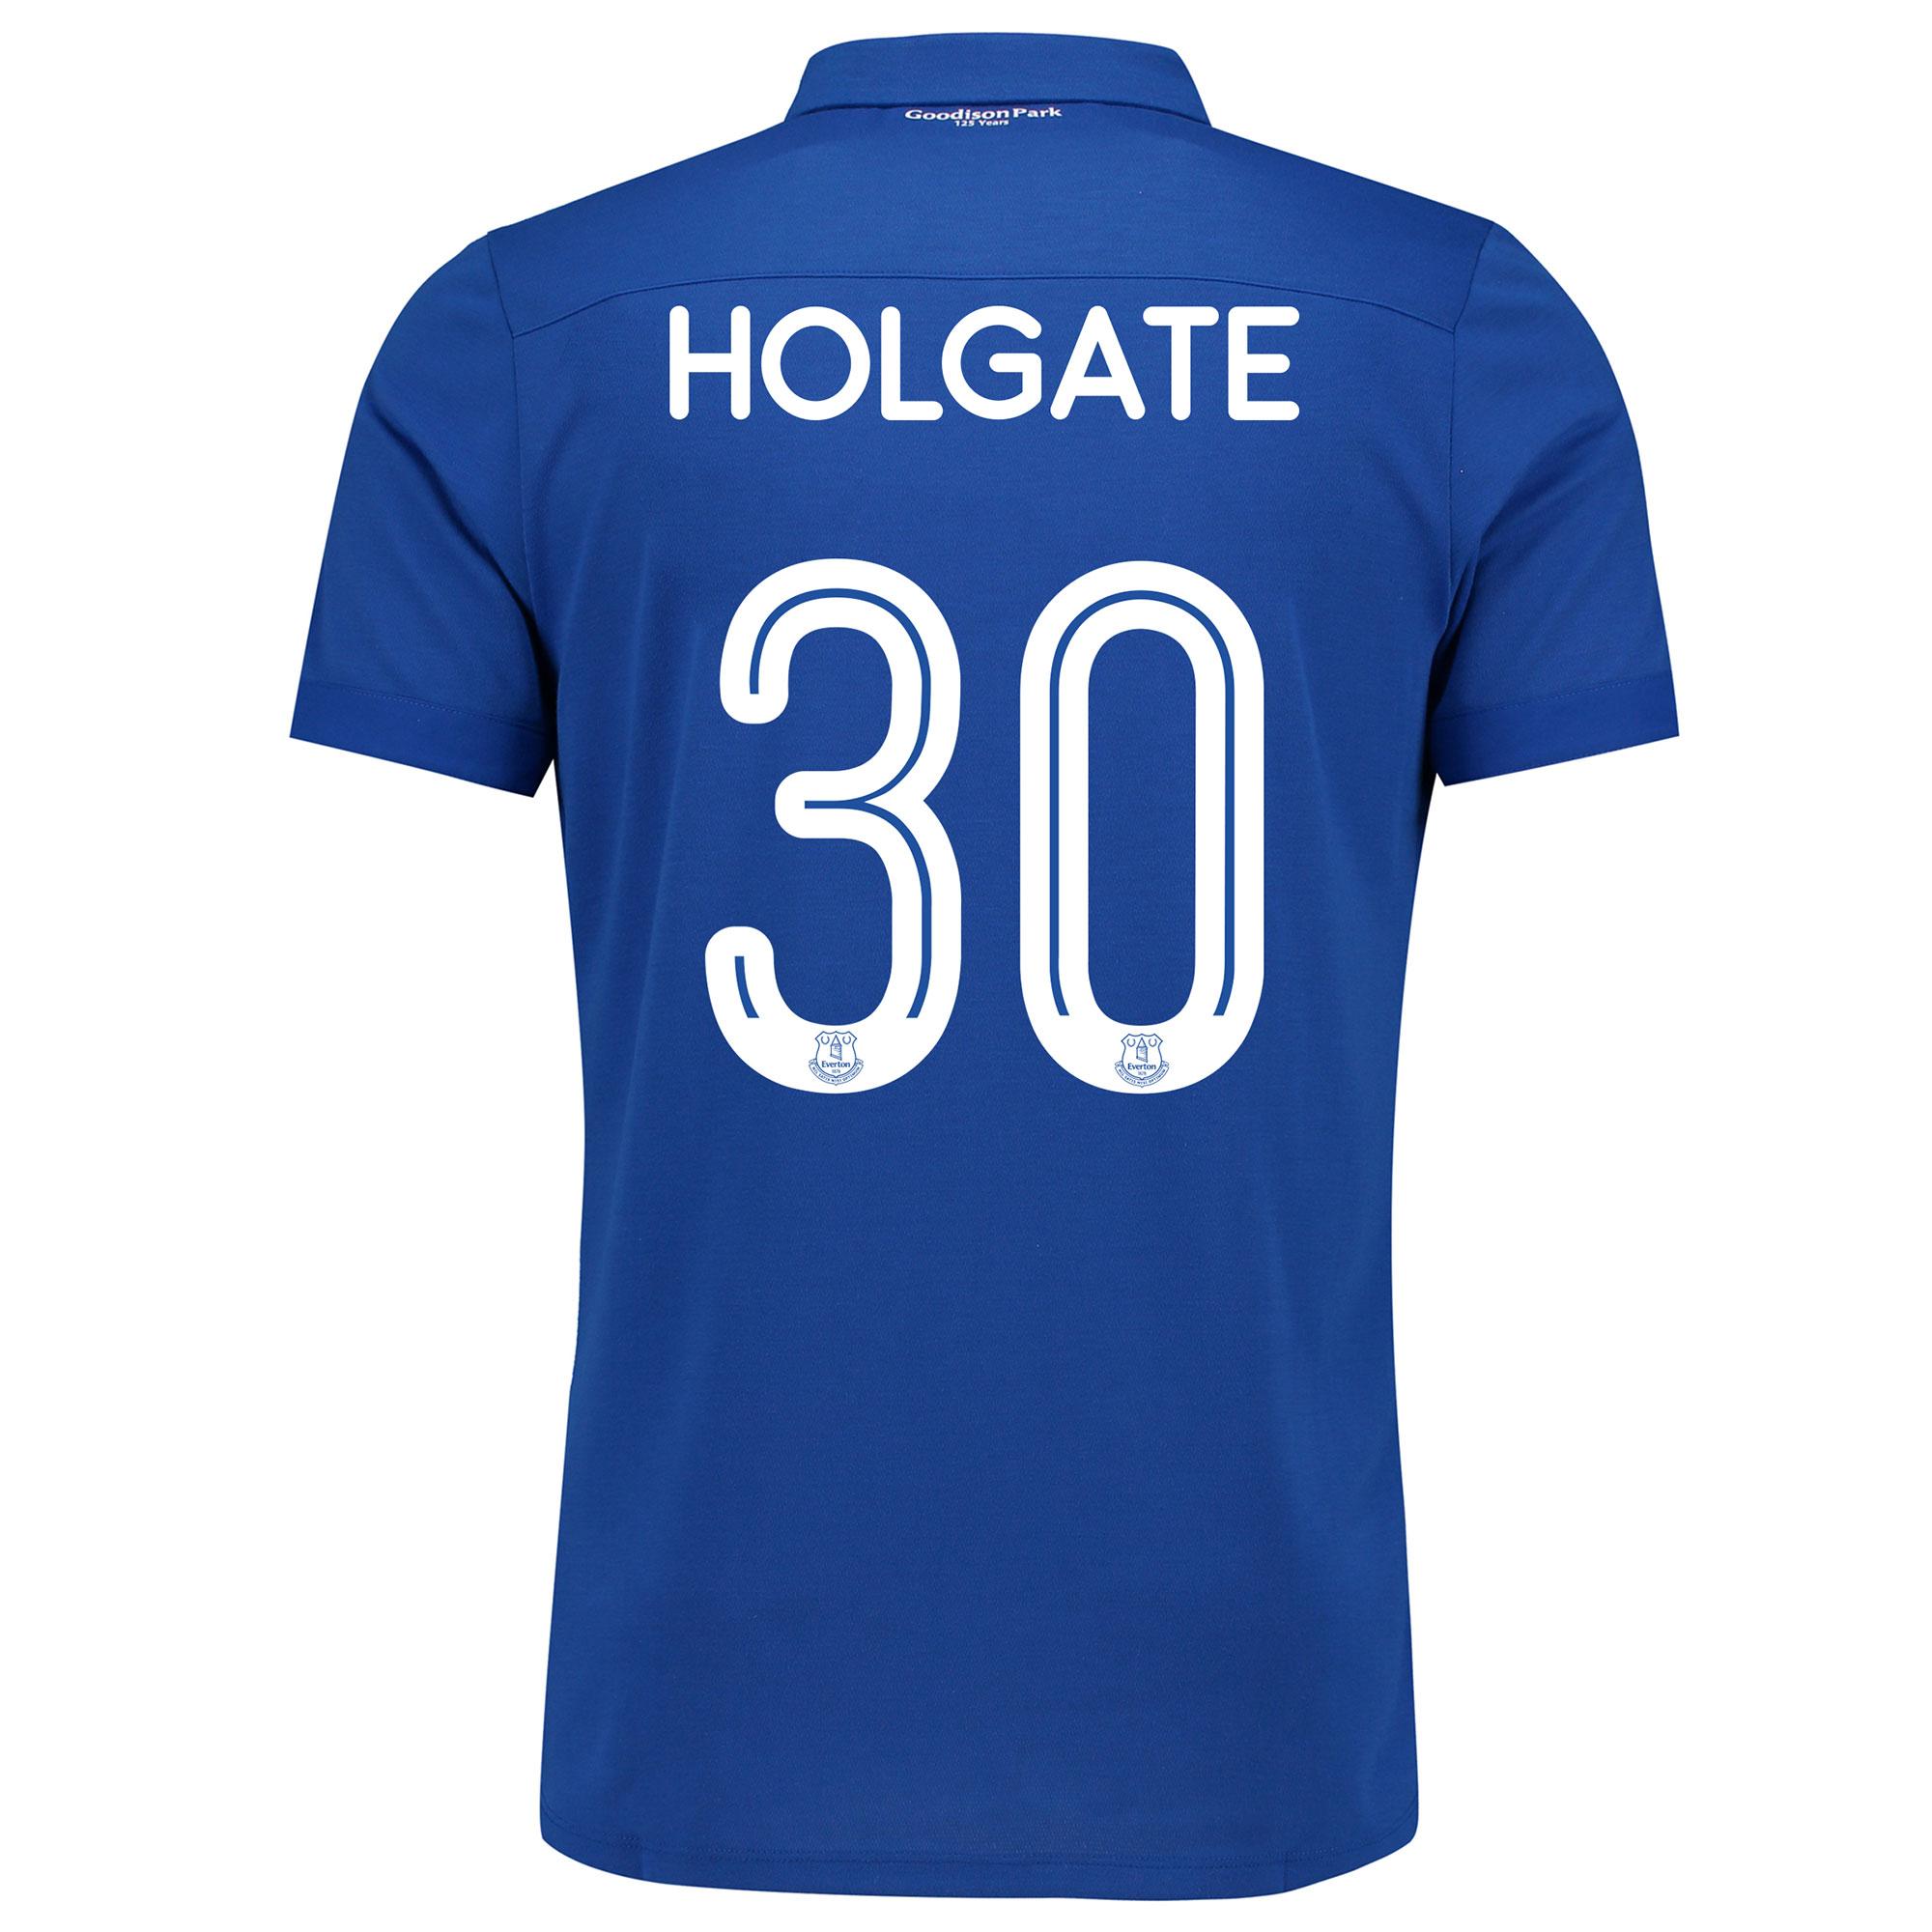 Image of Everton Commemorative Shirt - Junior with Holgate 30 printing